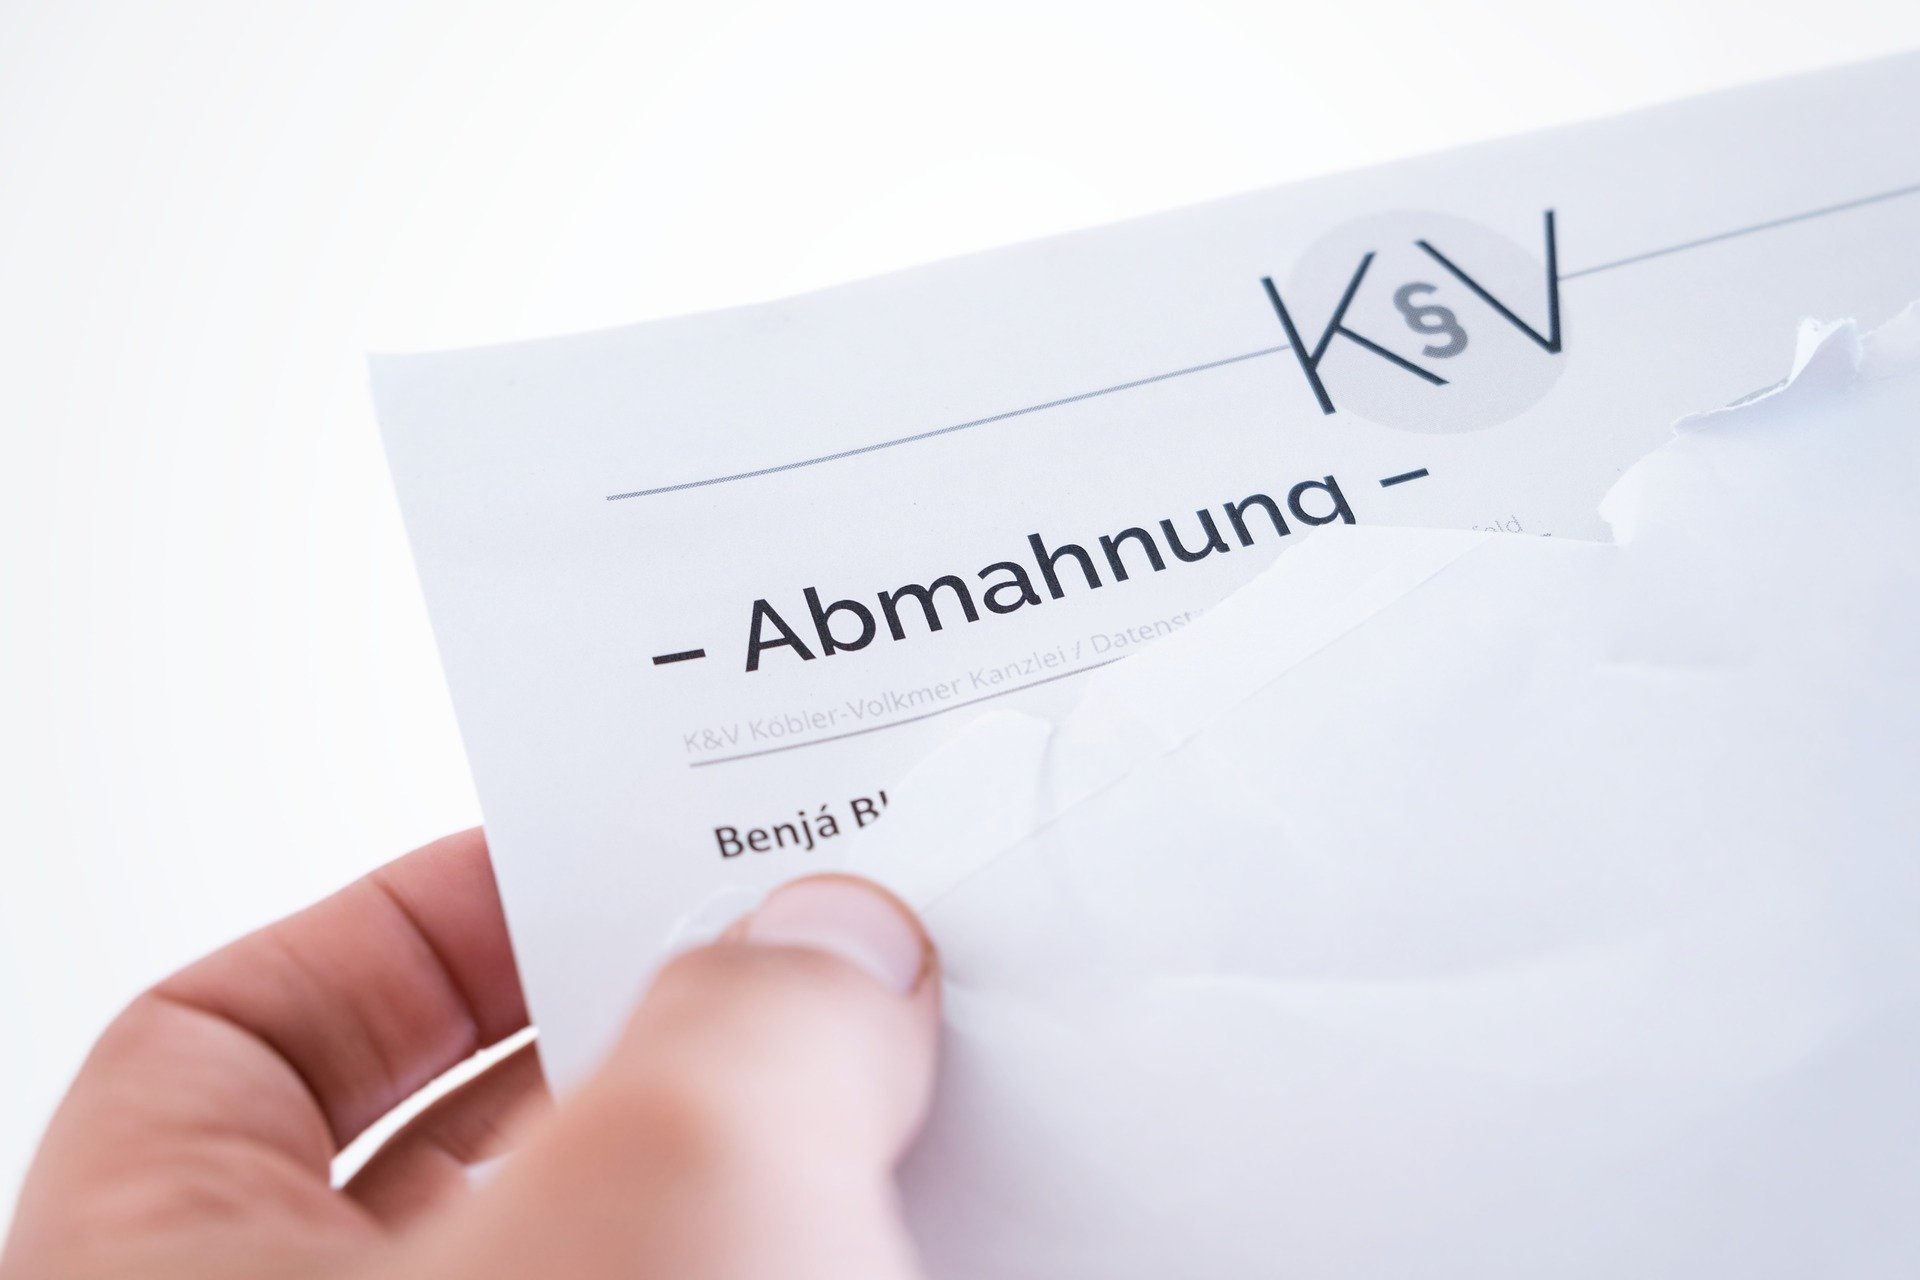 Webdesign Ahrensburg - Abmahnungen